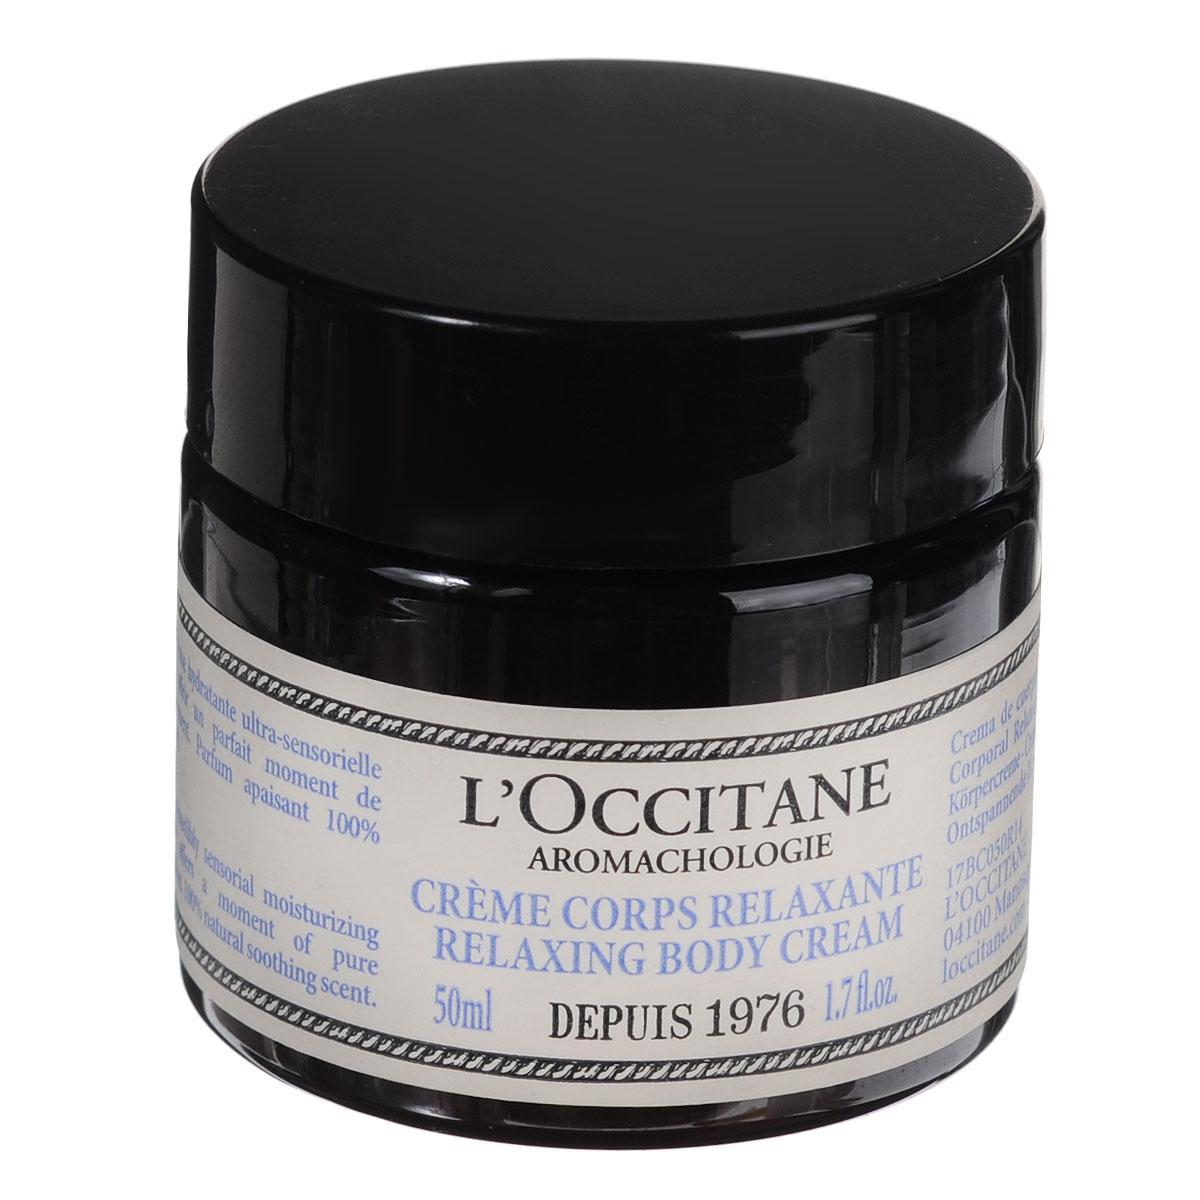 LOccitane Крем для тела Аромакология, расслабляющий, 50 мл (LOccitane En Provence)